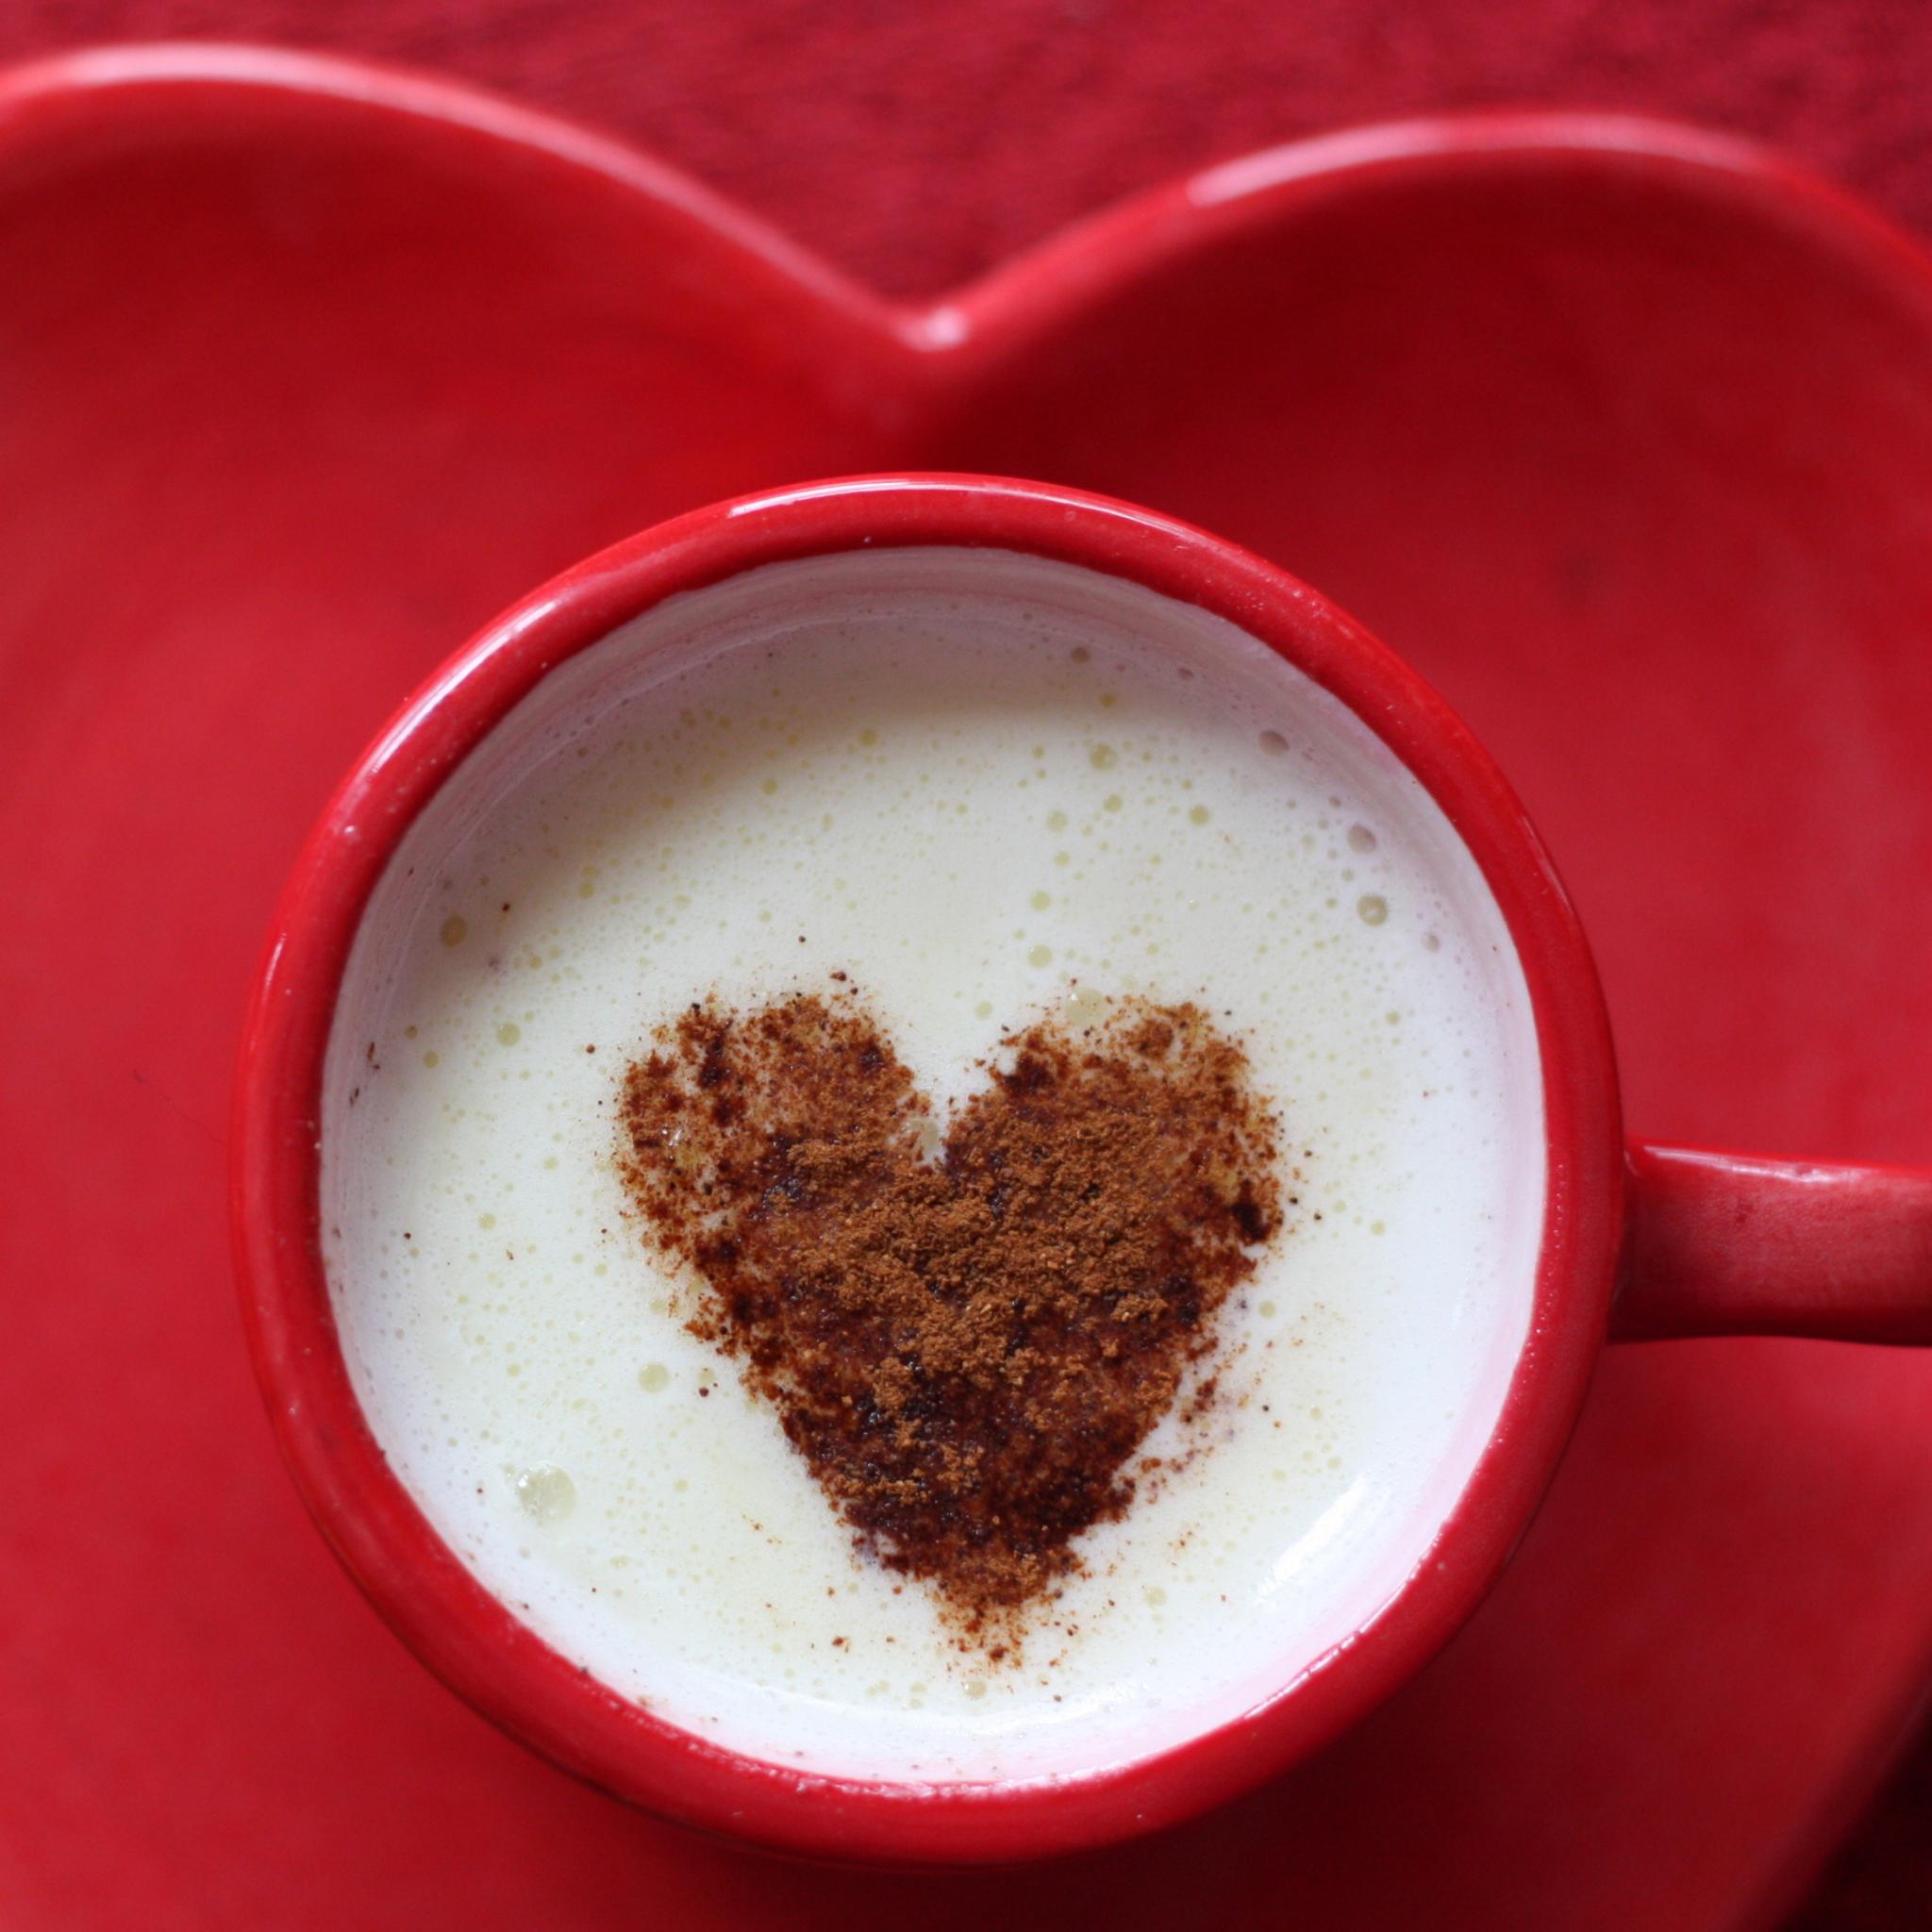 Сердце капучино чашка бесплатно